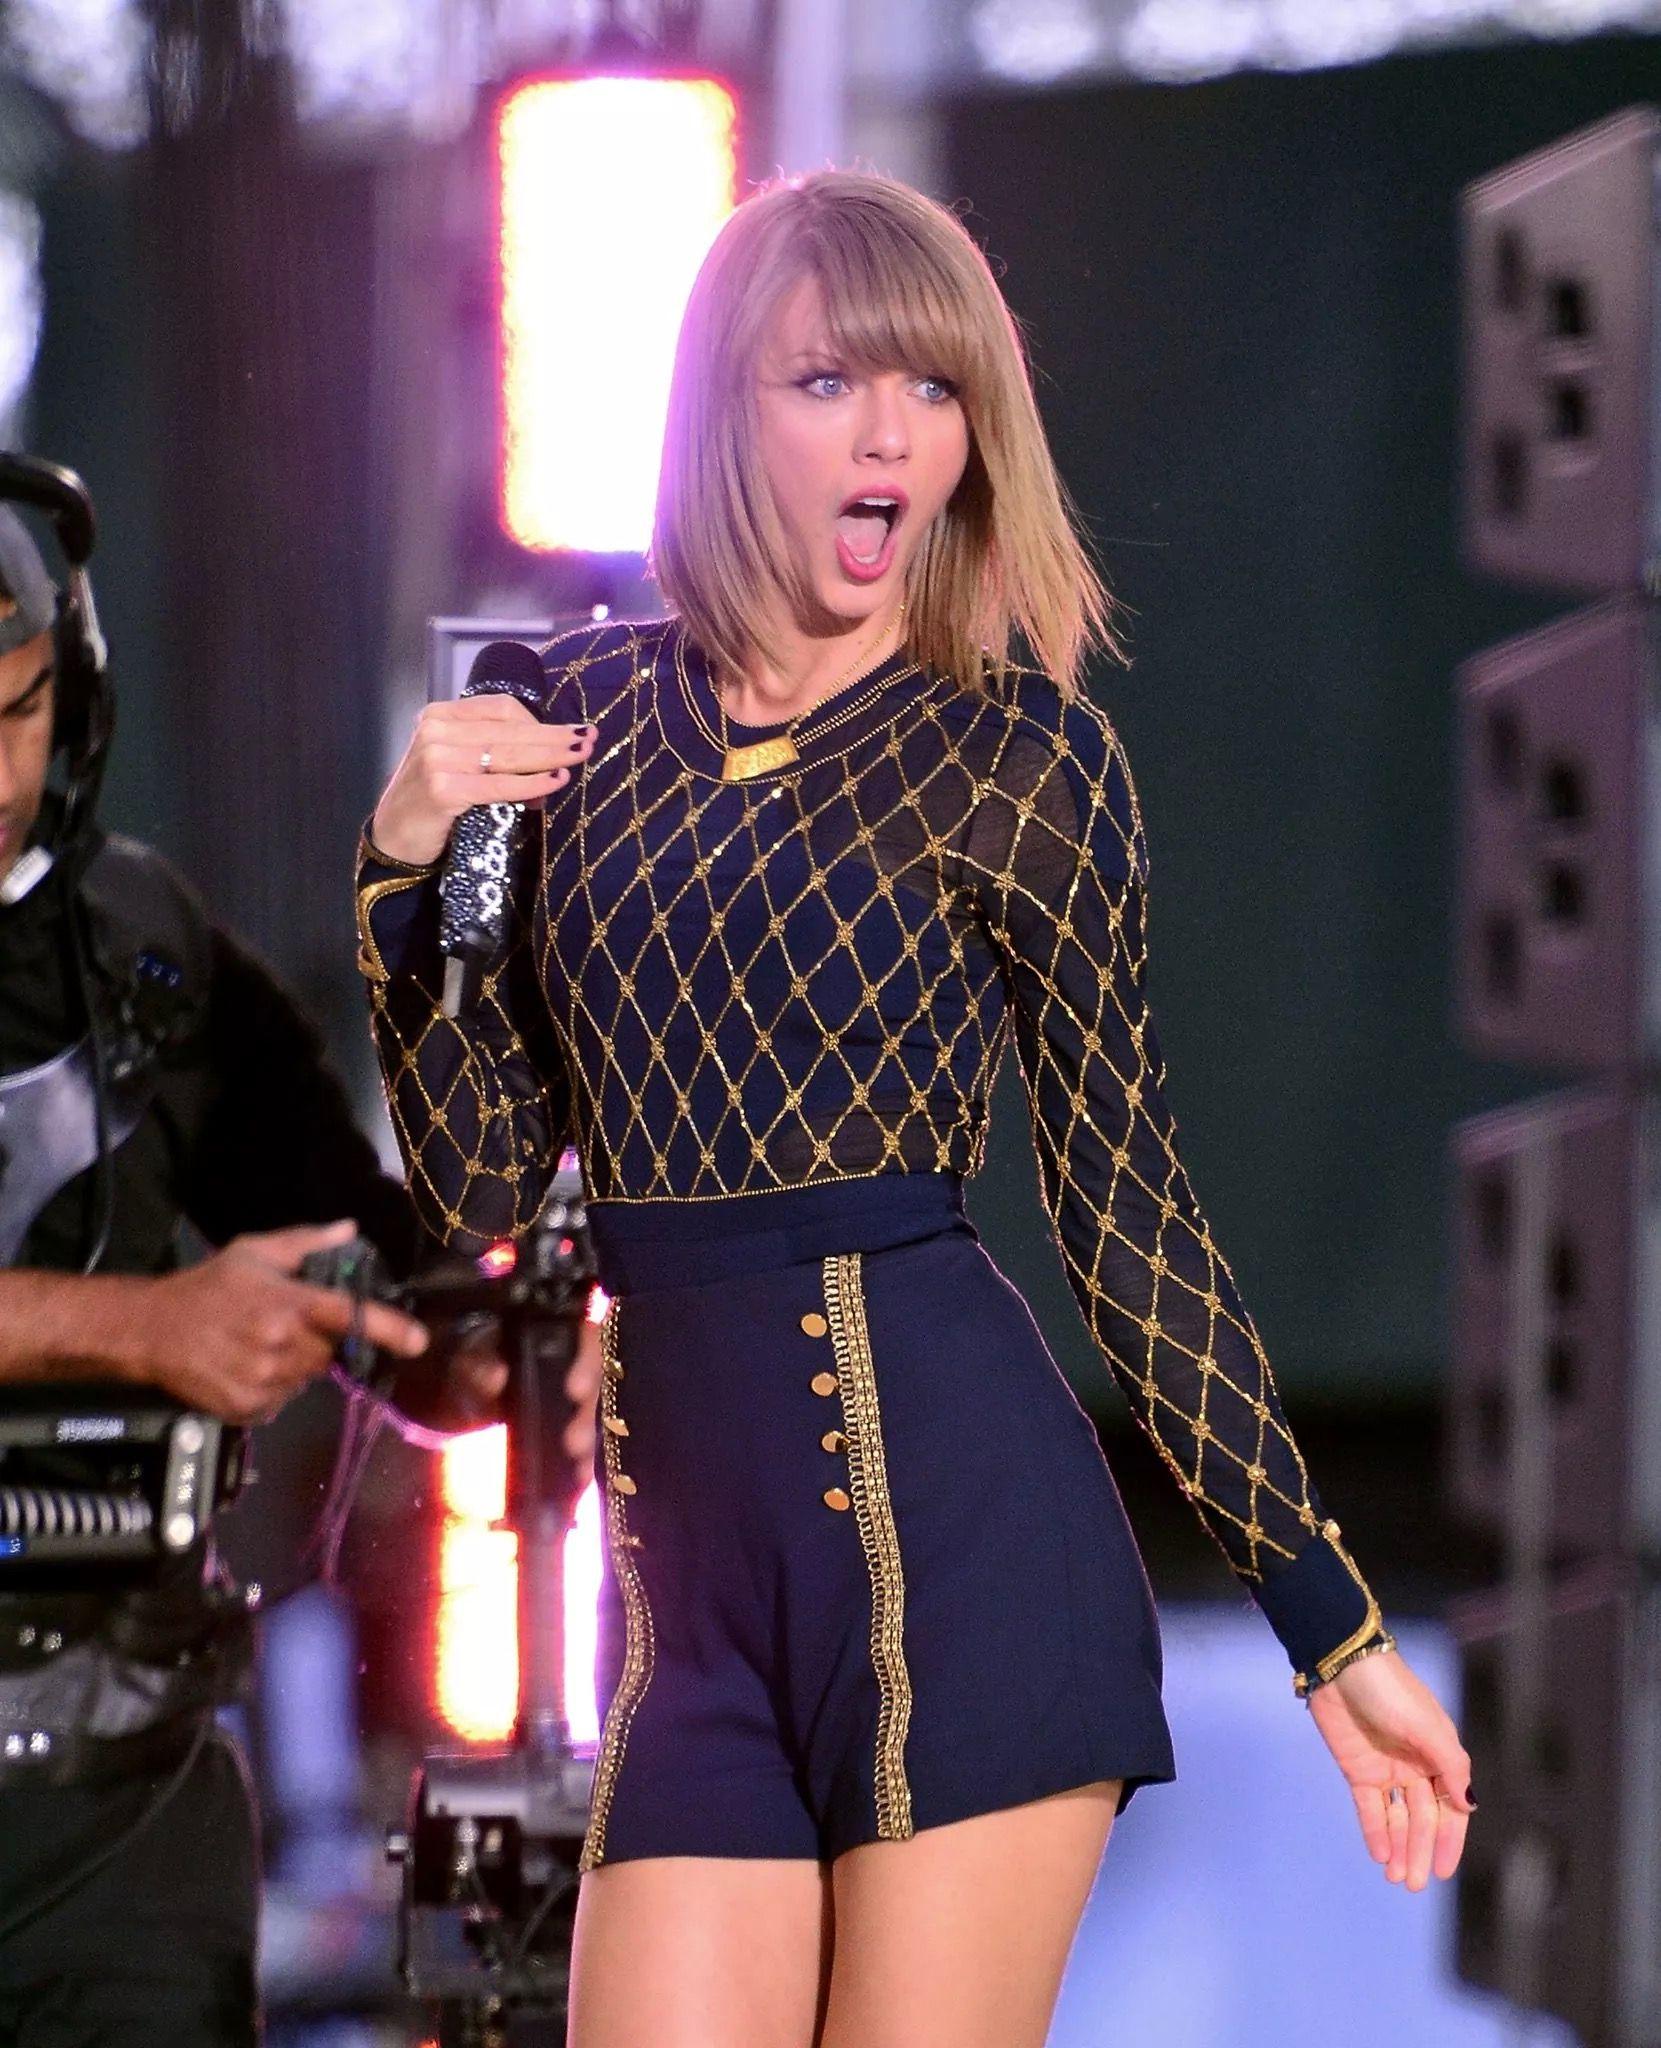 Pin by Shiana Tyler on Taylor Swift | Taylor swift style ...